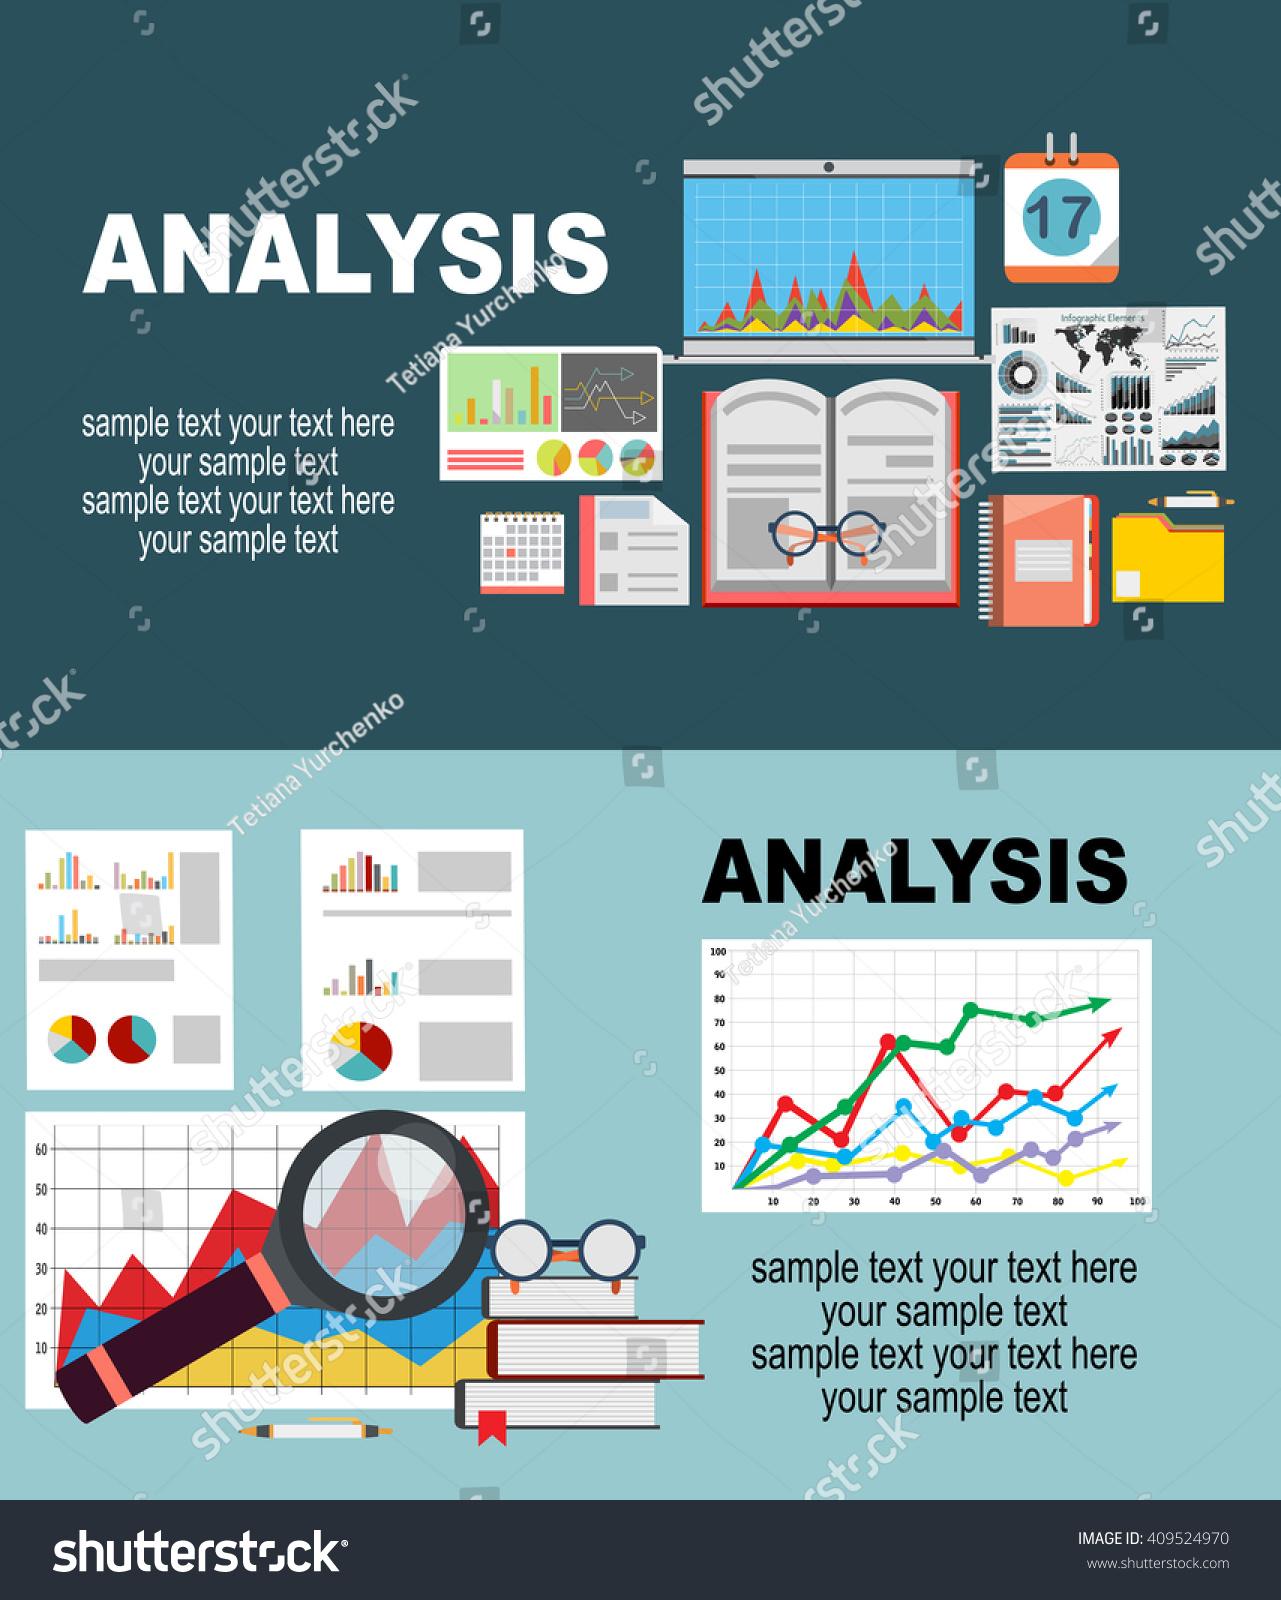 Flat Design Illustration Concepts Business Analysis Stock Vector 409524970 Shutterstock